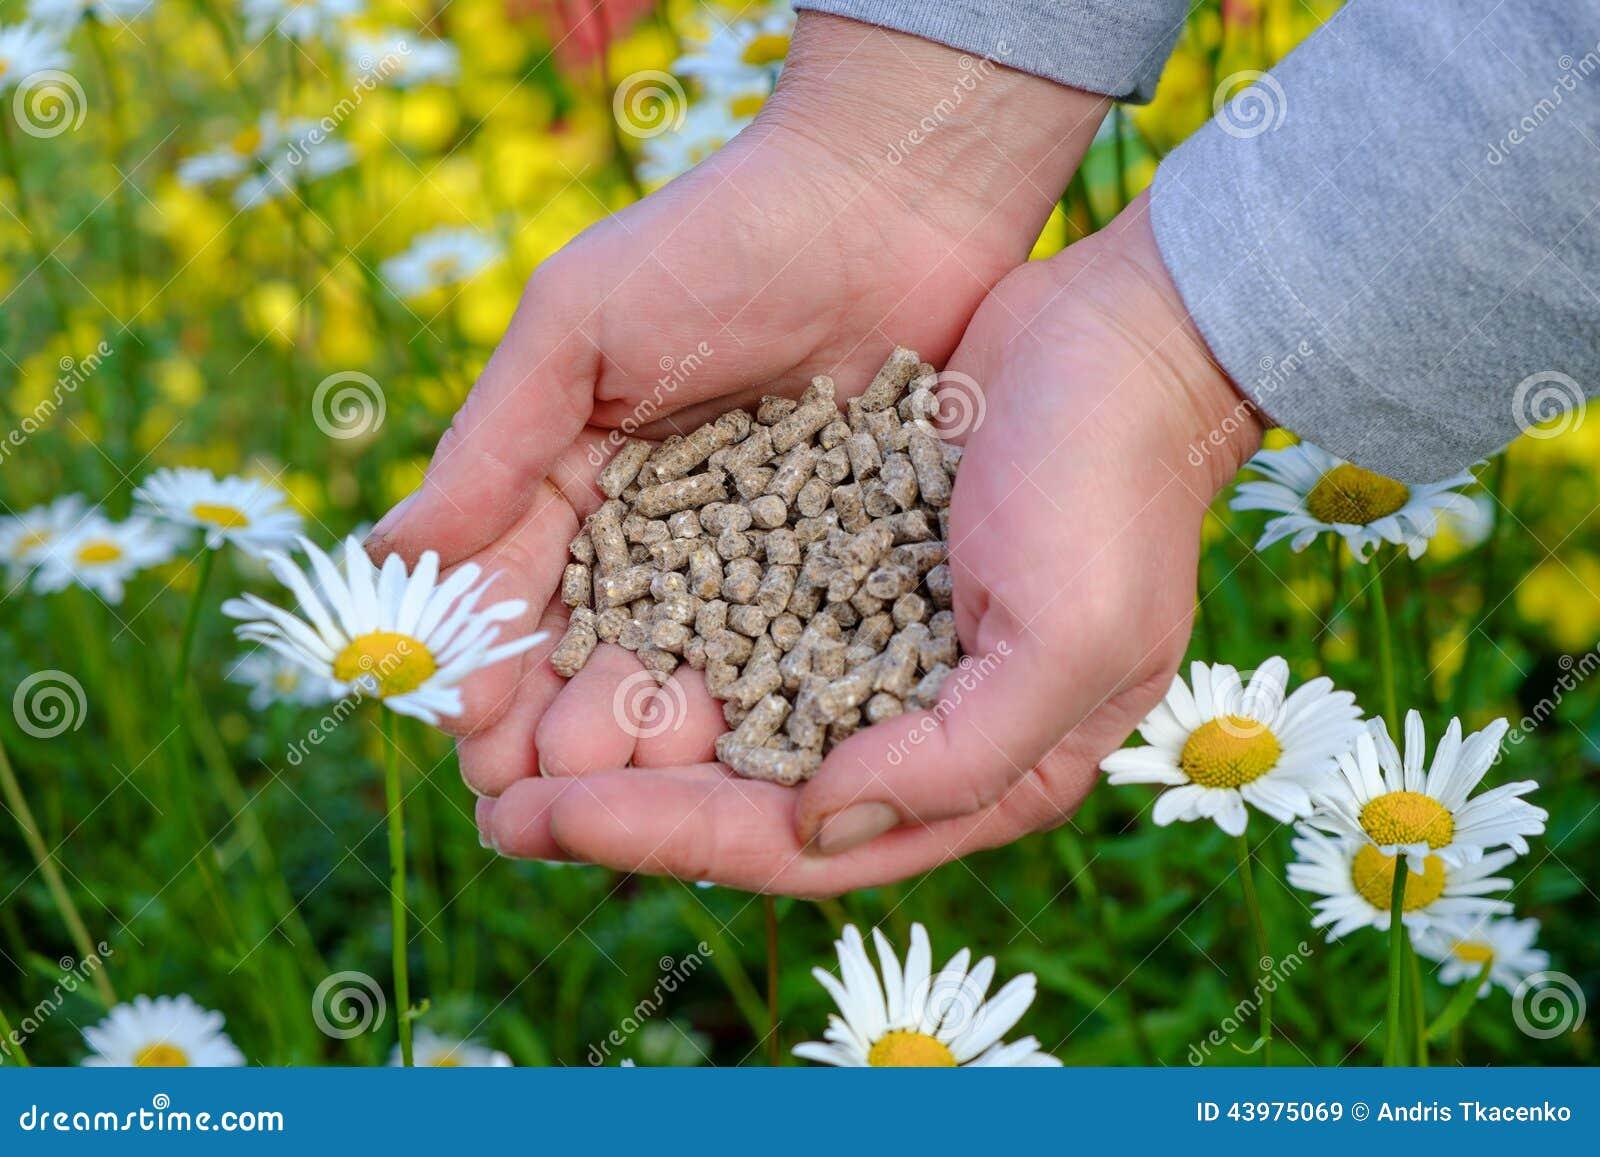 Hands with fertilizer